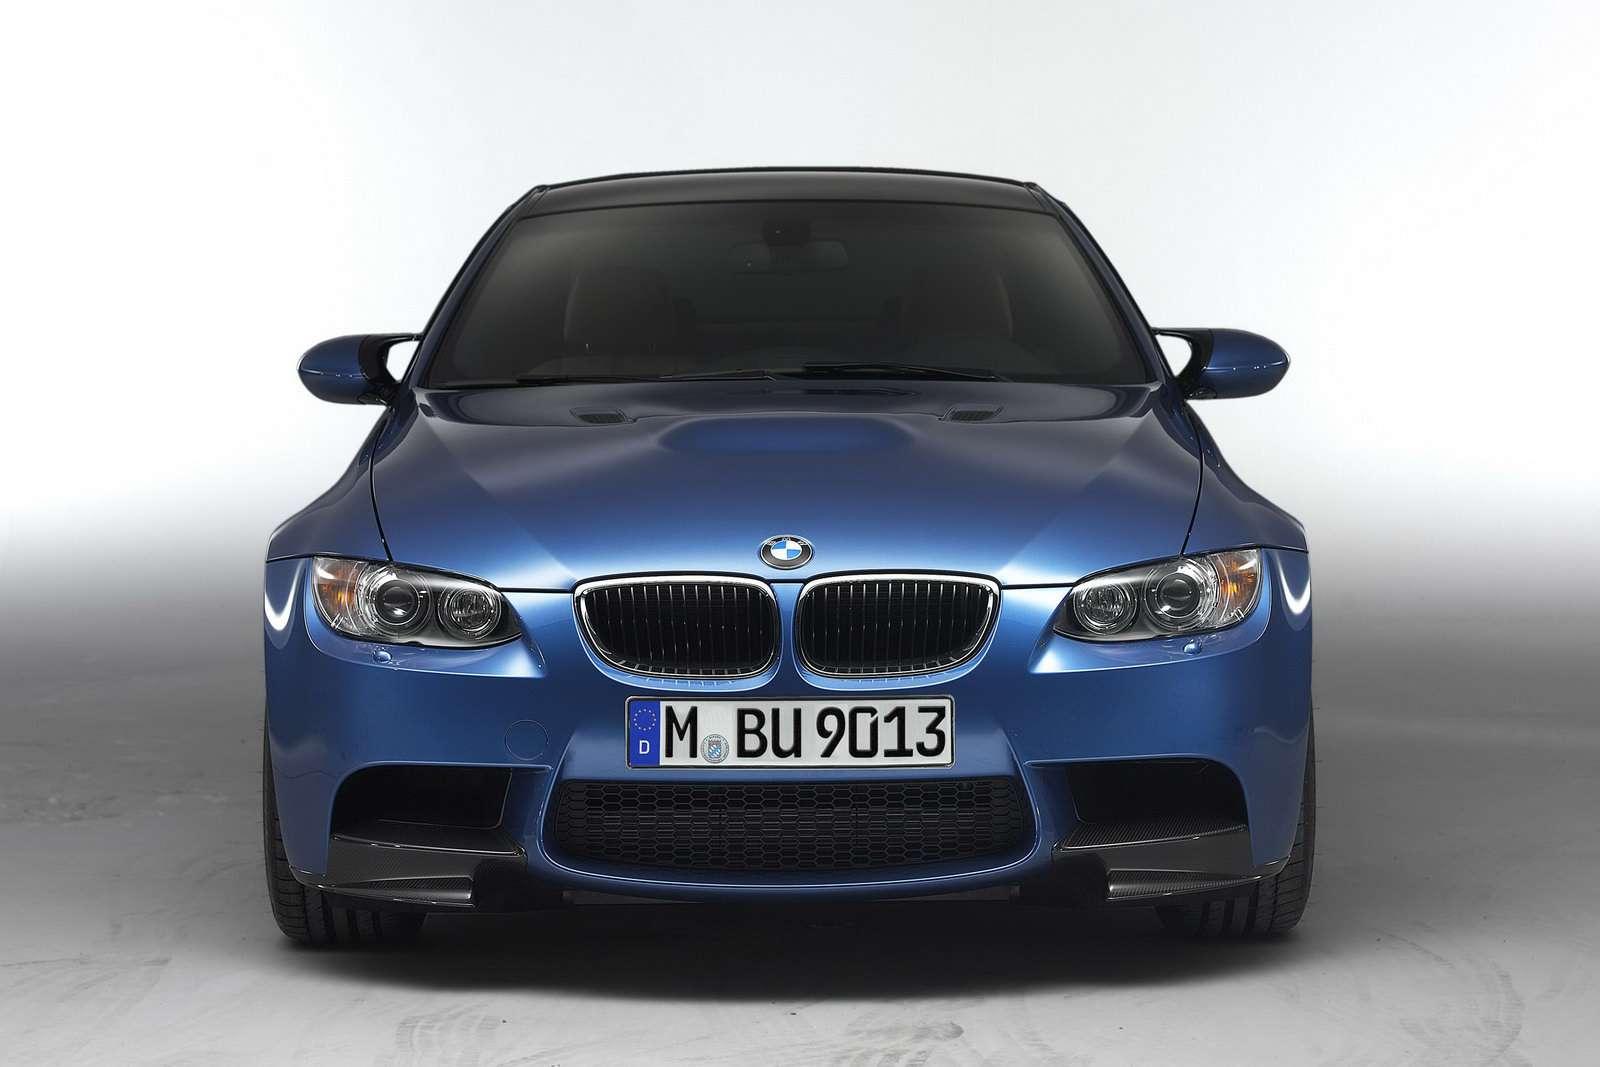 BMW M3 2011 po facelifcie 2010